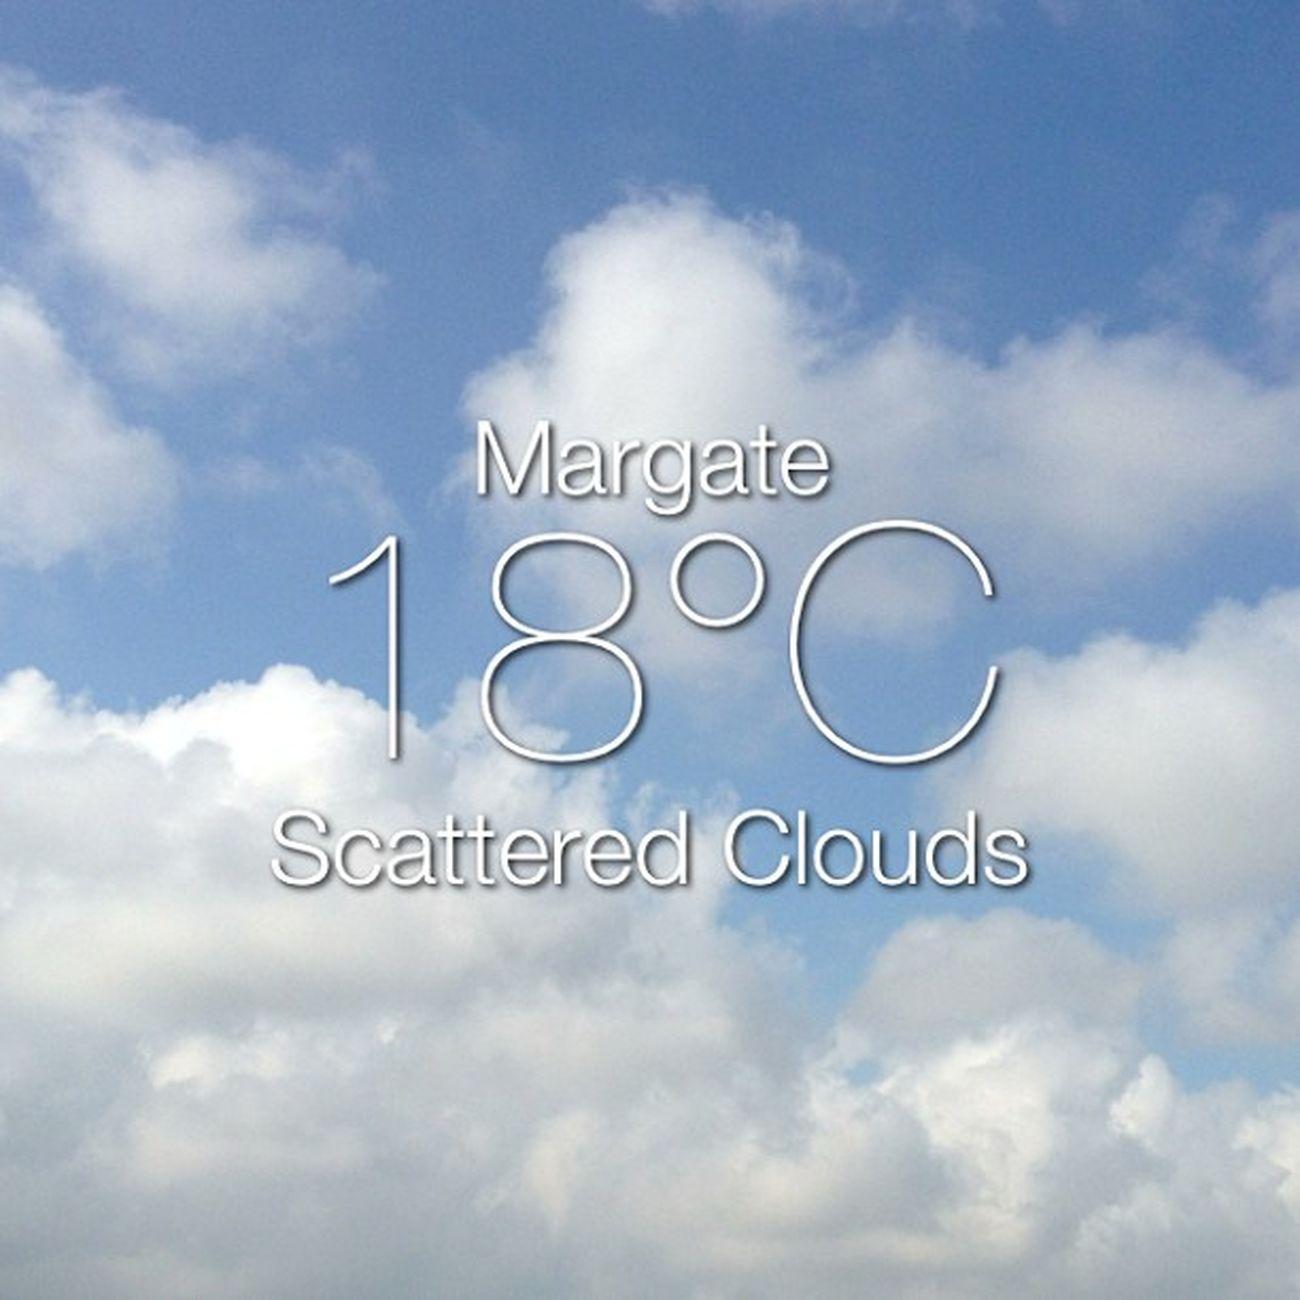 Weather Instaweather Instaweatherpro Sky outdoors nature world margate unitedkingdom day summer gb